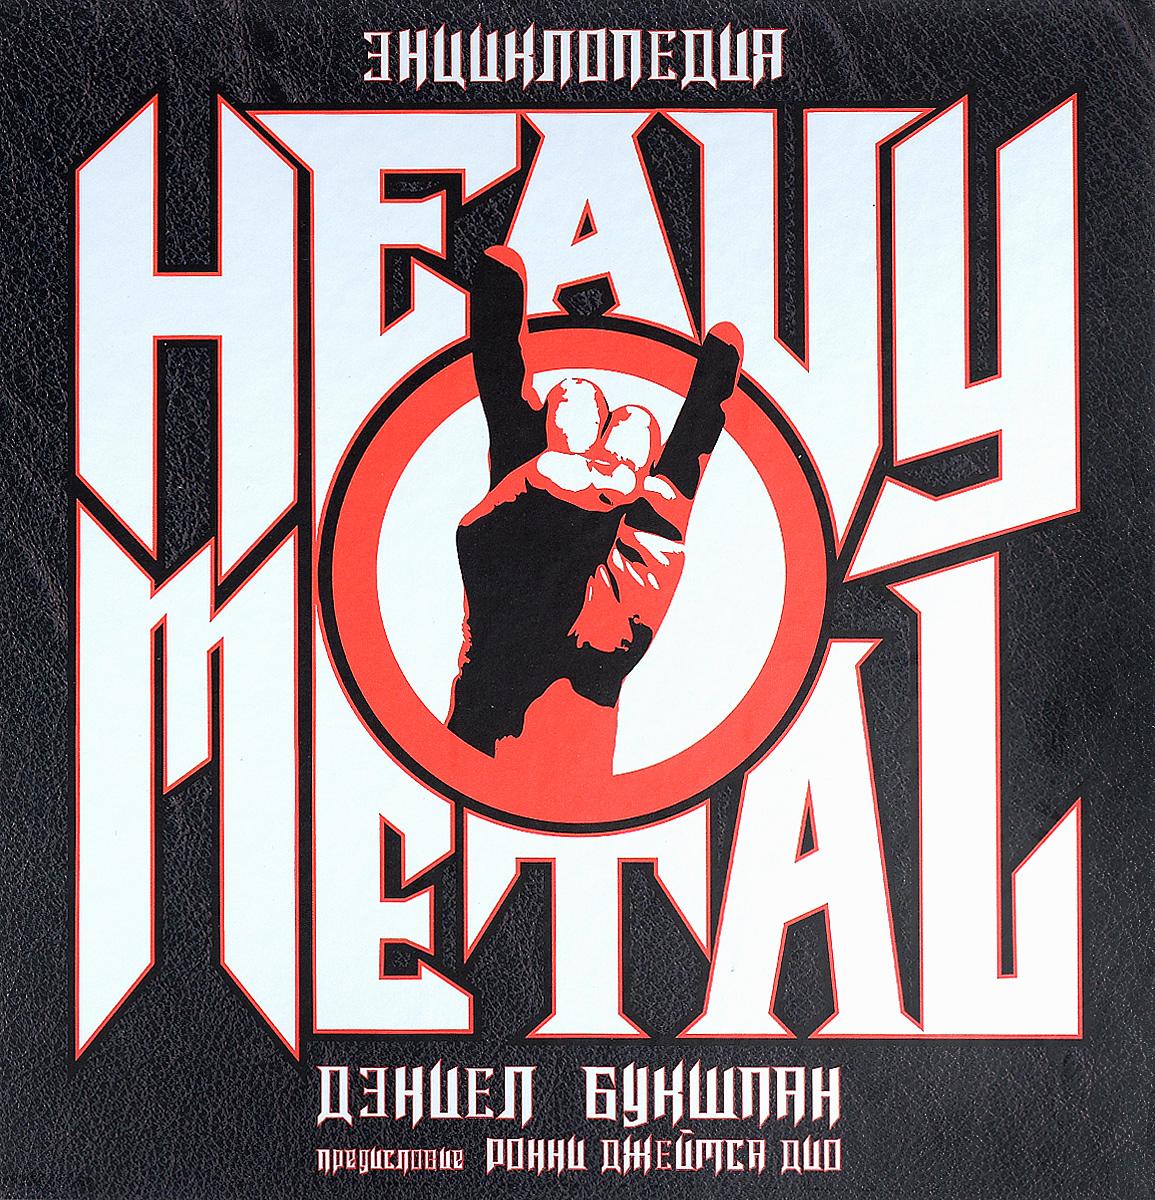 Энциклопедия Heavy Metal. Дэниел Букшпан